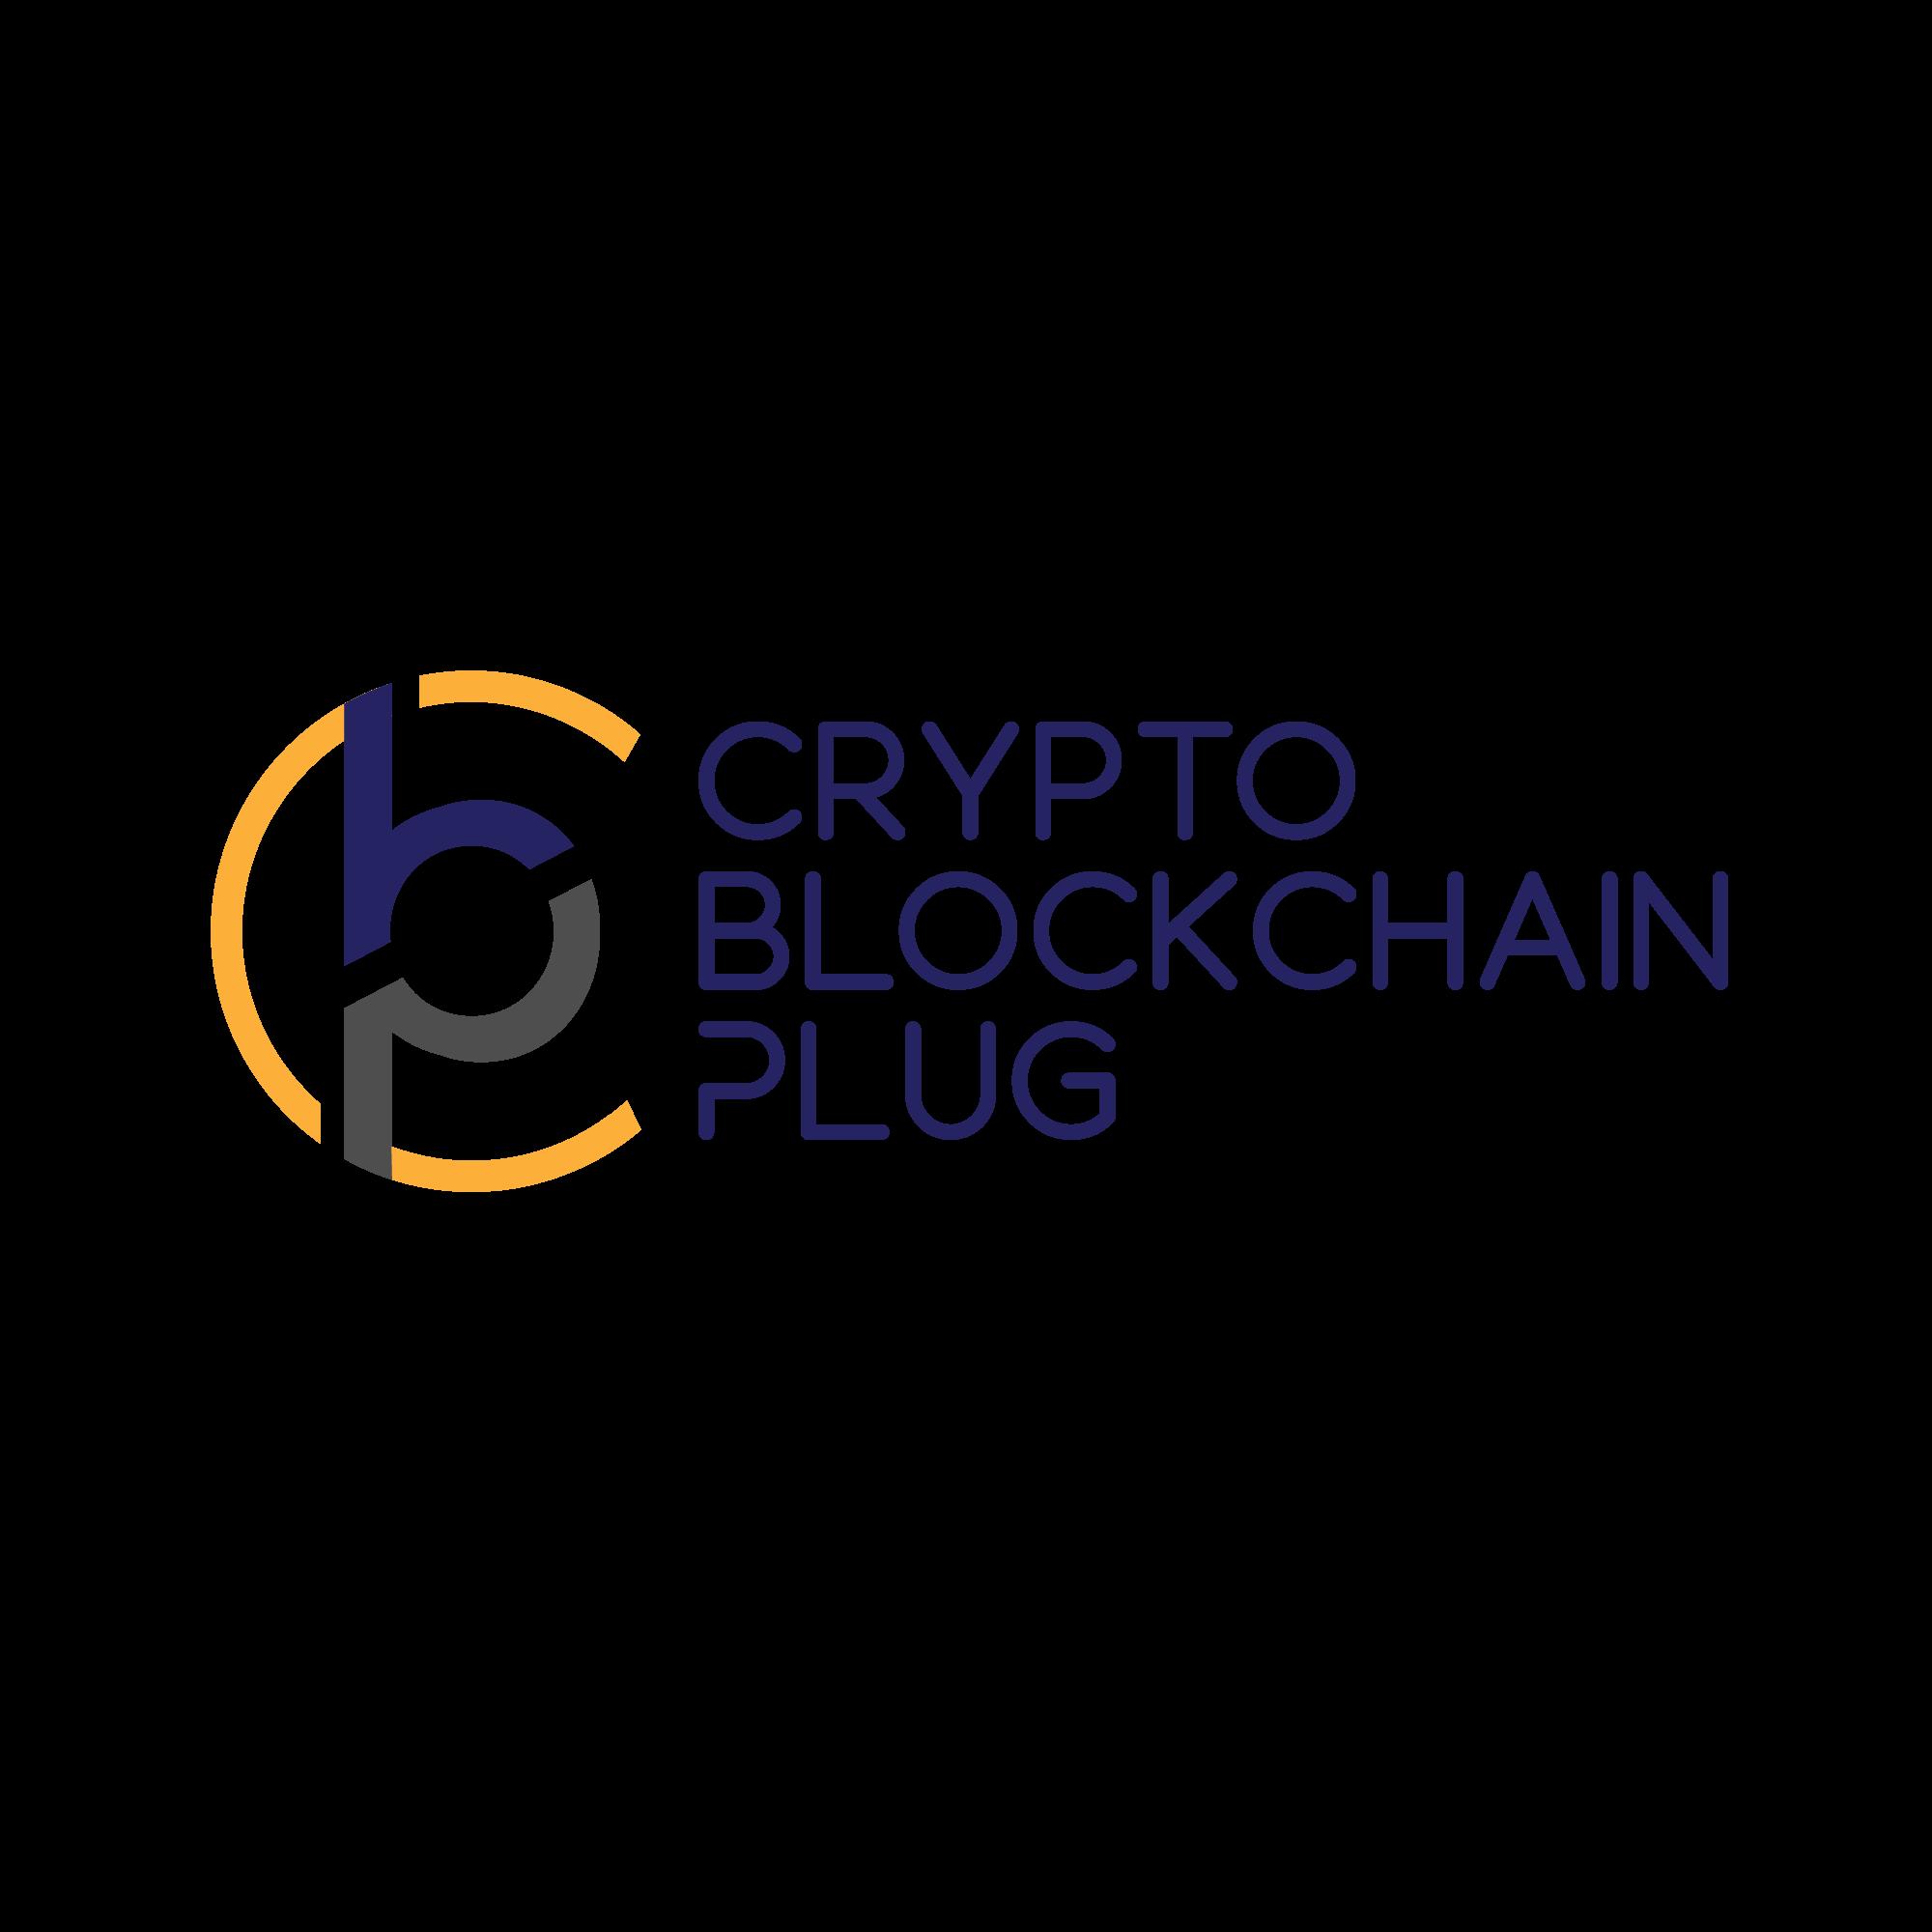 Crypto Blockchain Plug